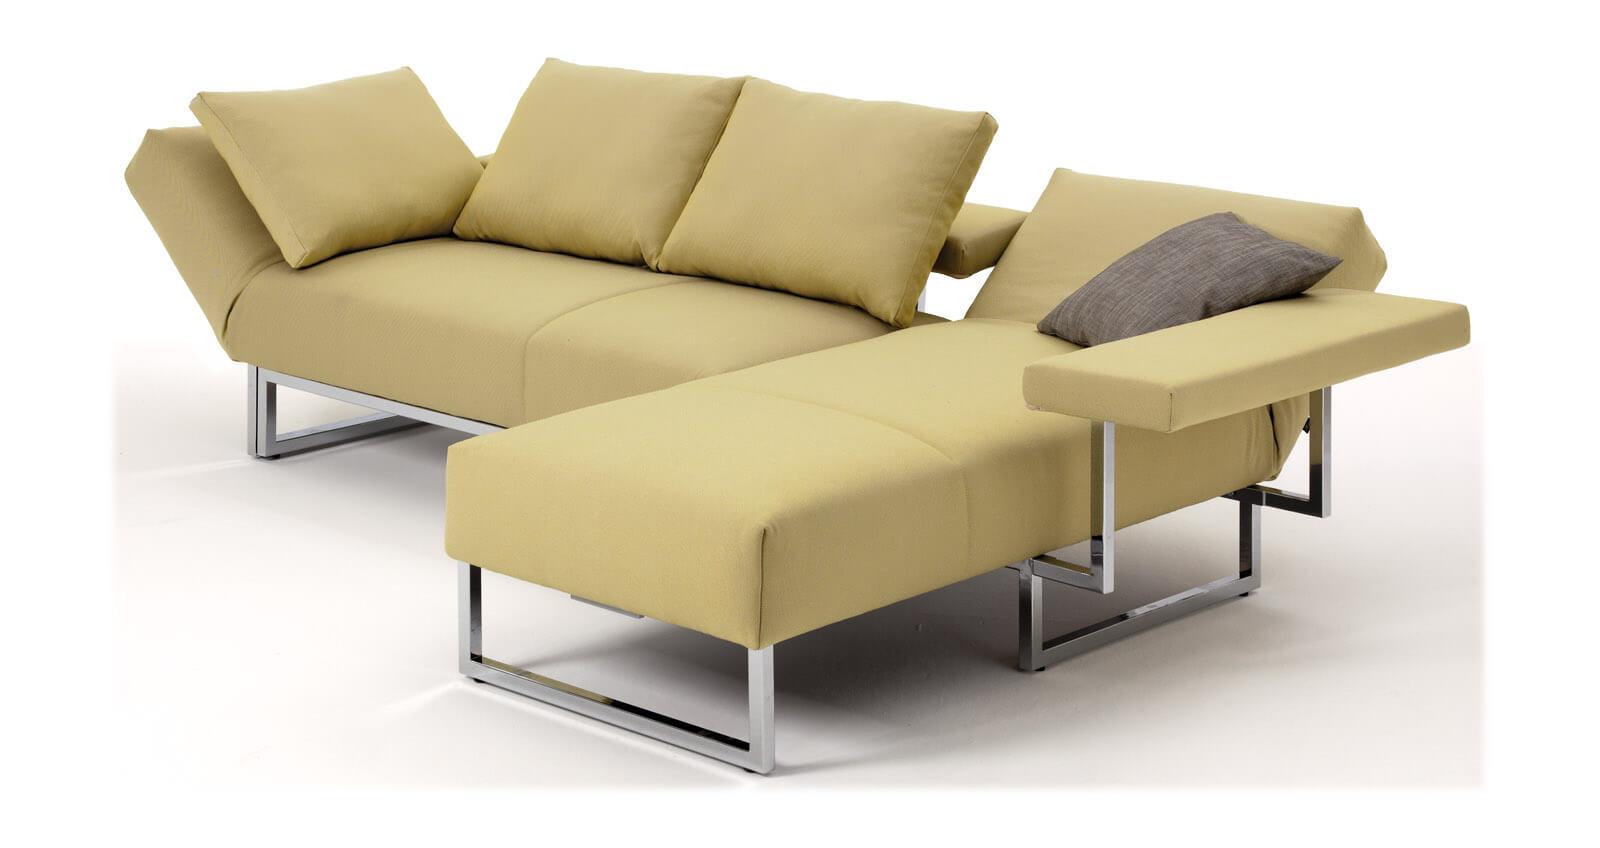 Franz Fertig Sofas sofabed twinset by franz fertig